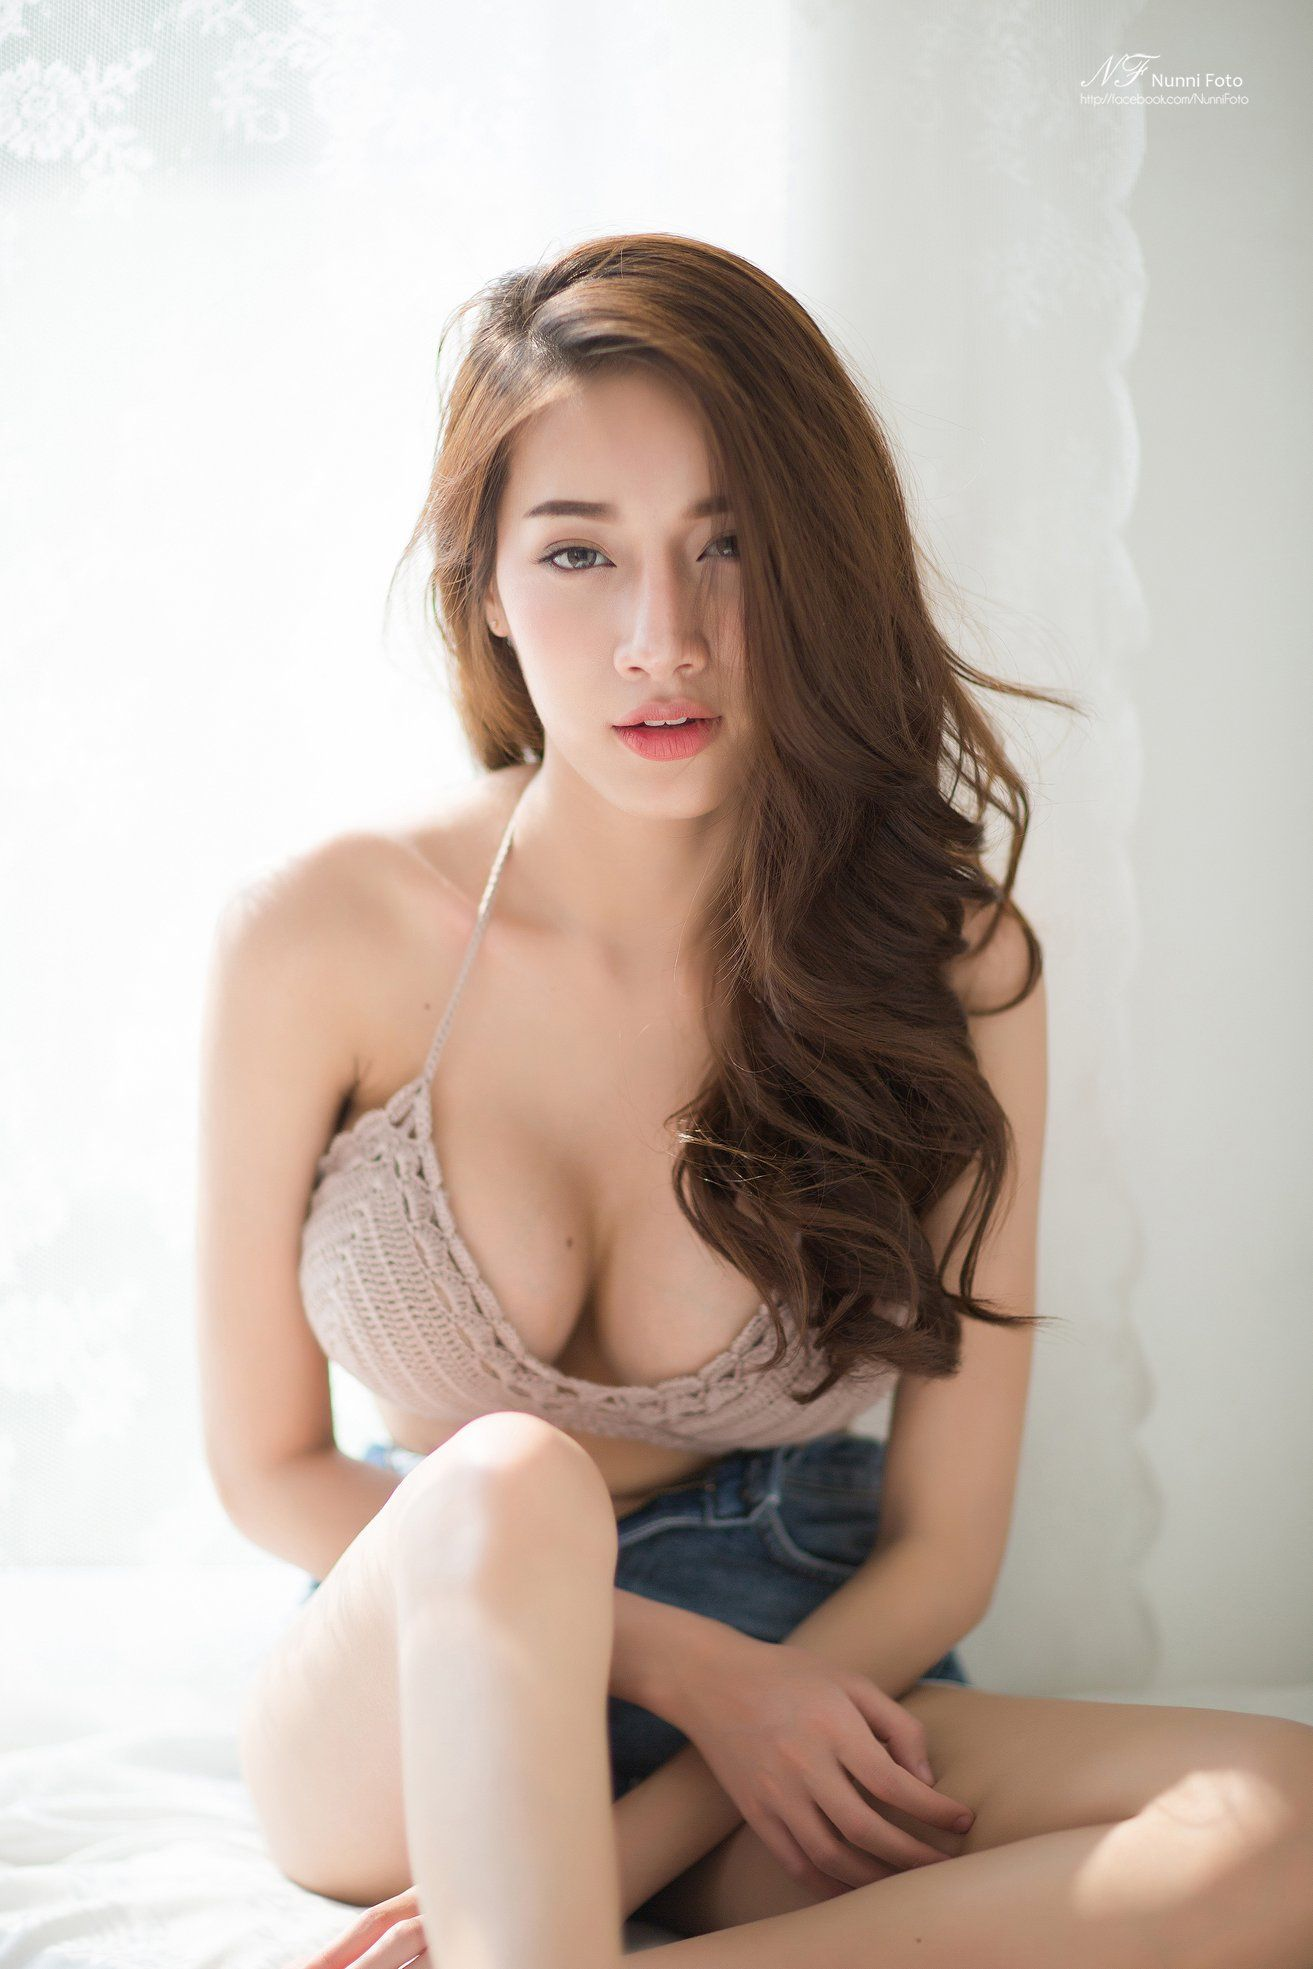 Domination sex stories